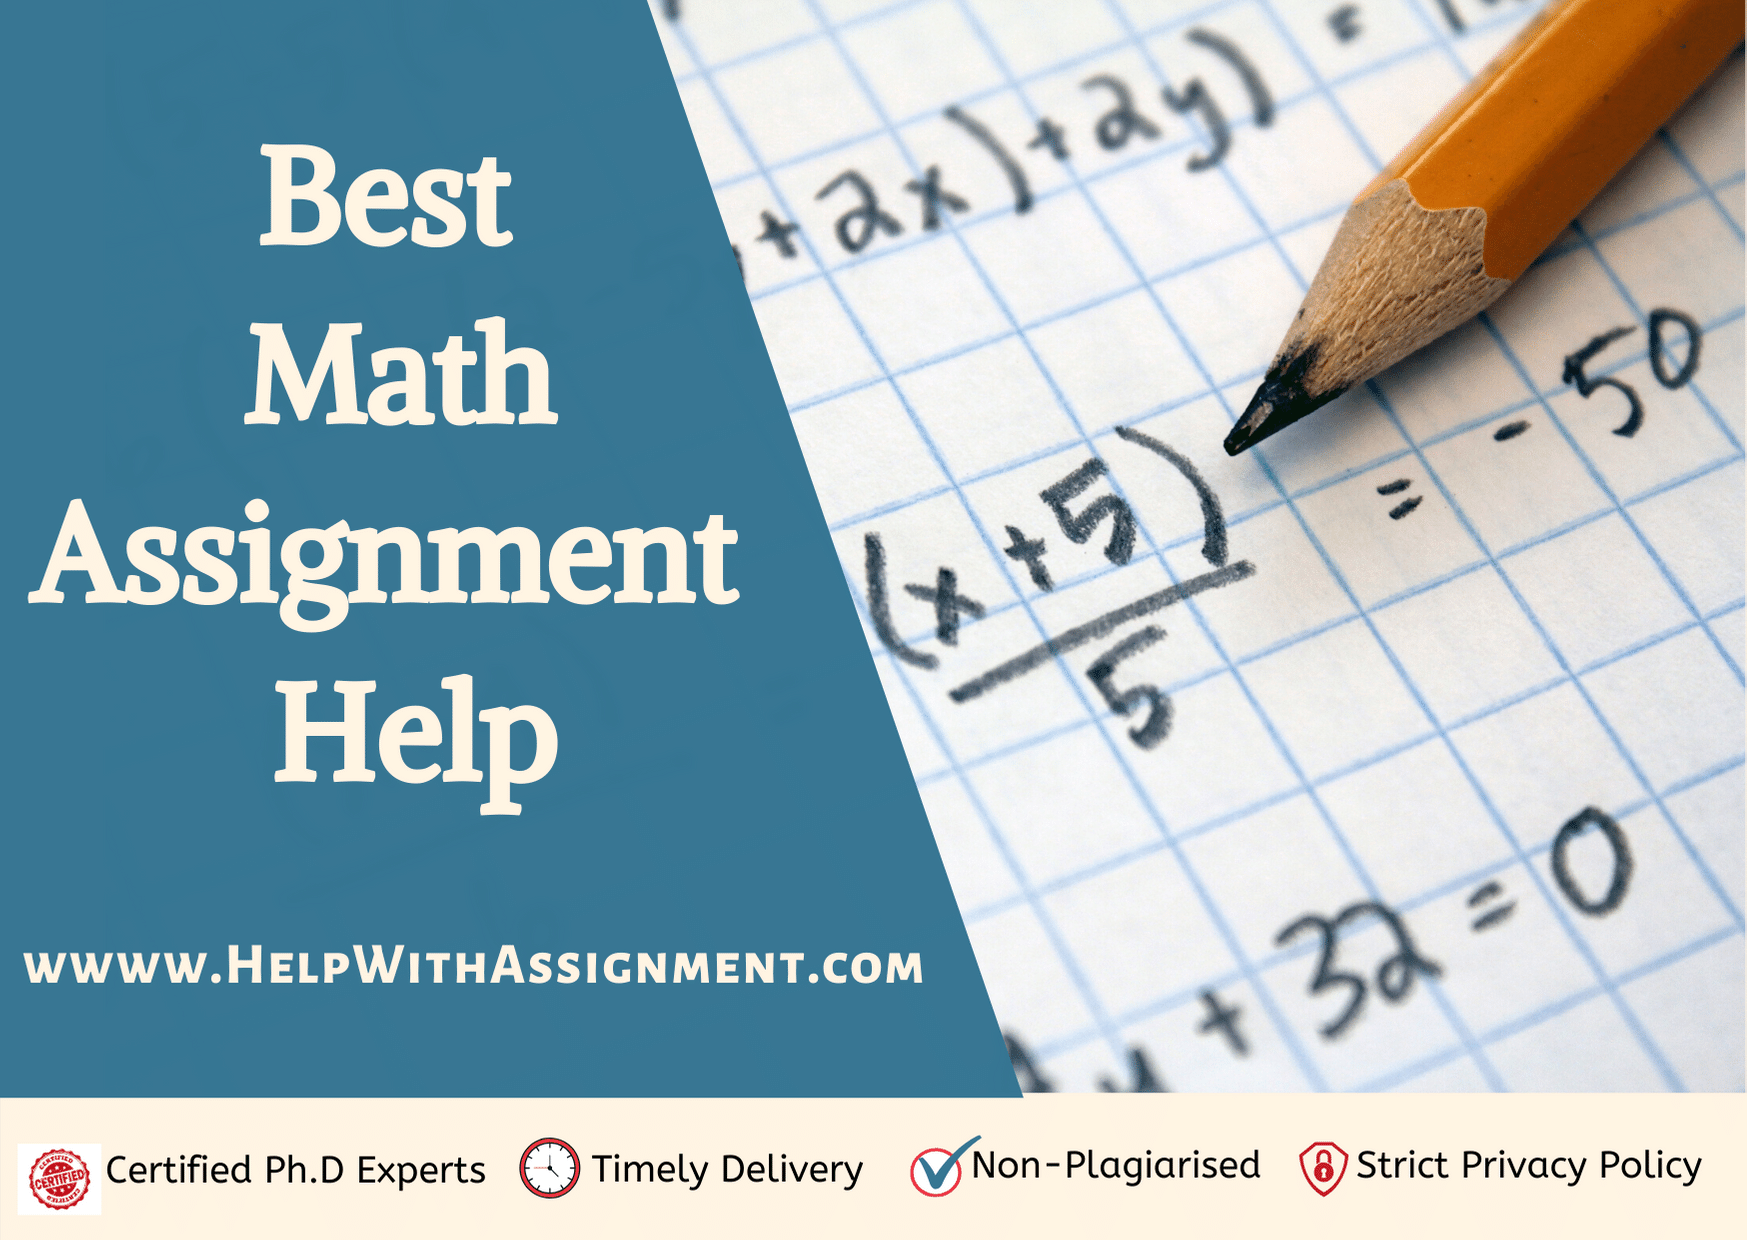 Math Homework Help - Answers to Math Problems - Hotmath